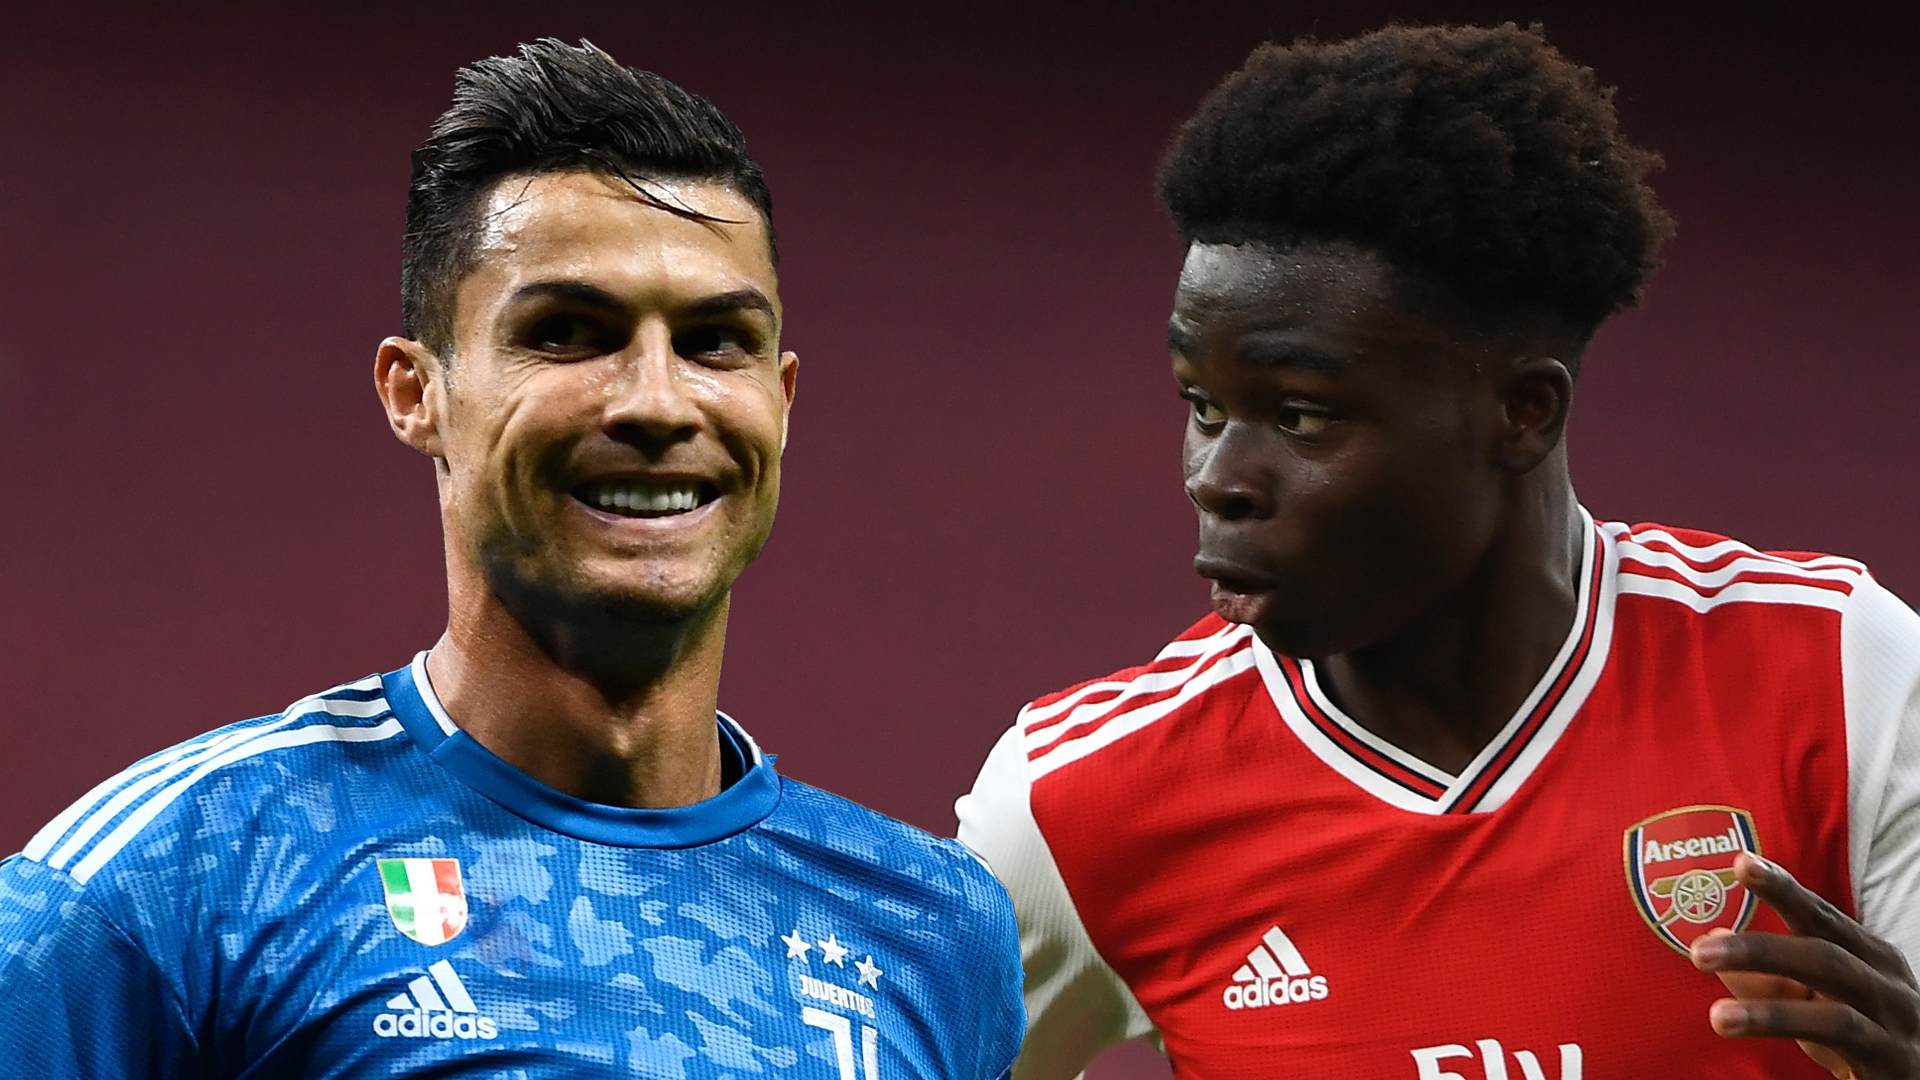 Ronaldo's my idol & I try to take things from his game - Arsenal teen sensation Saka